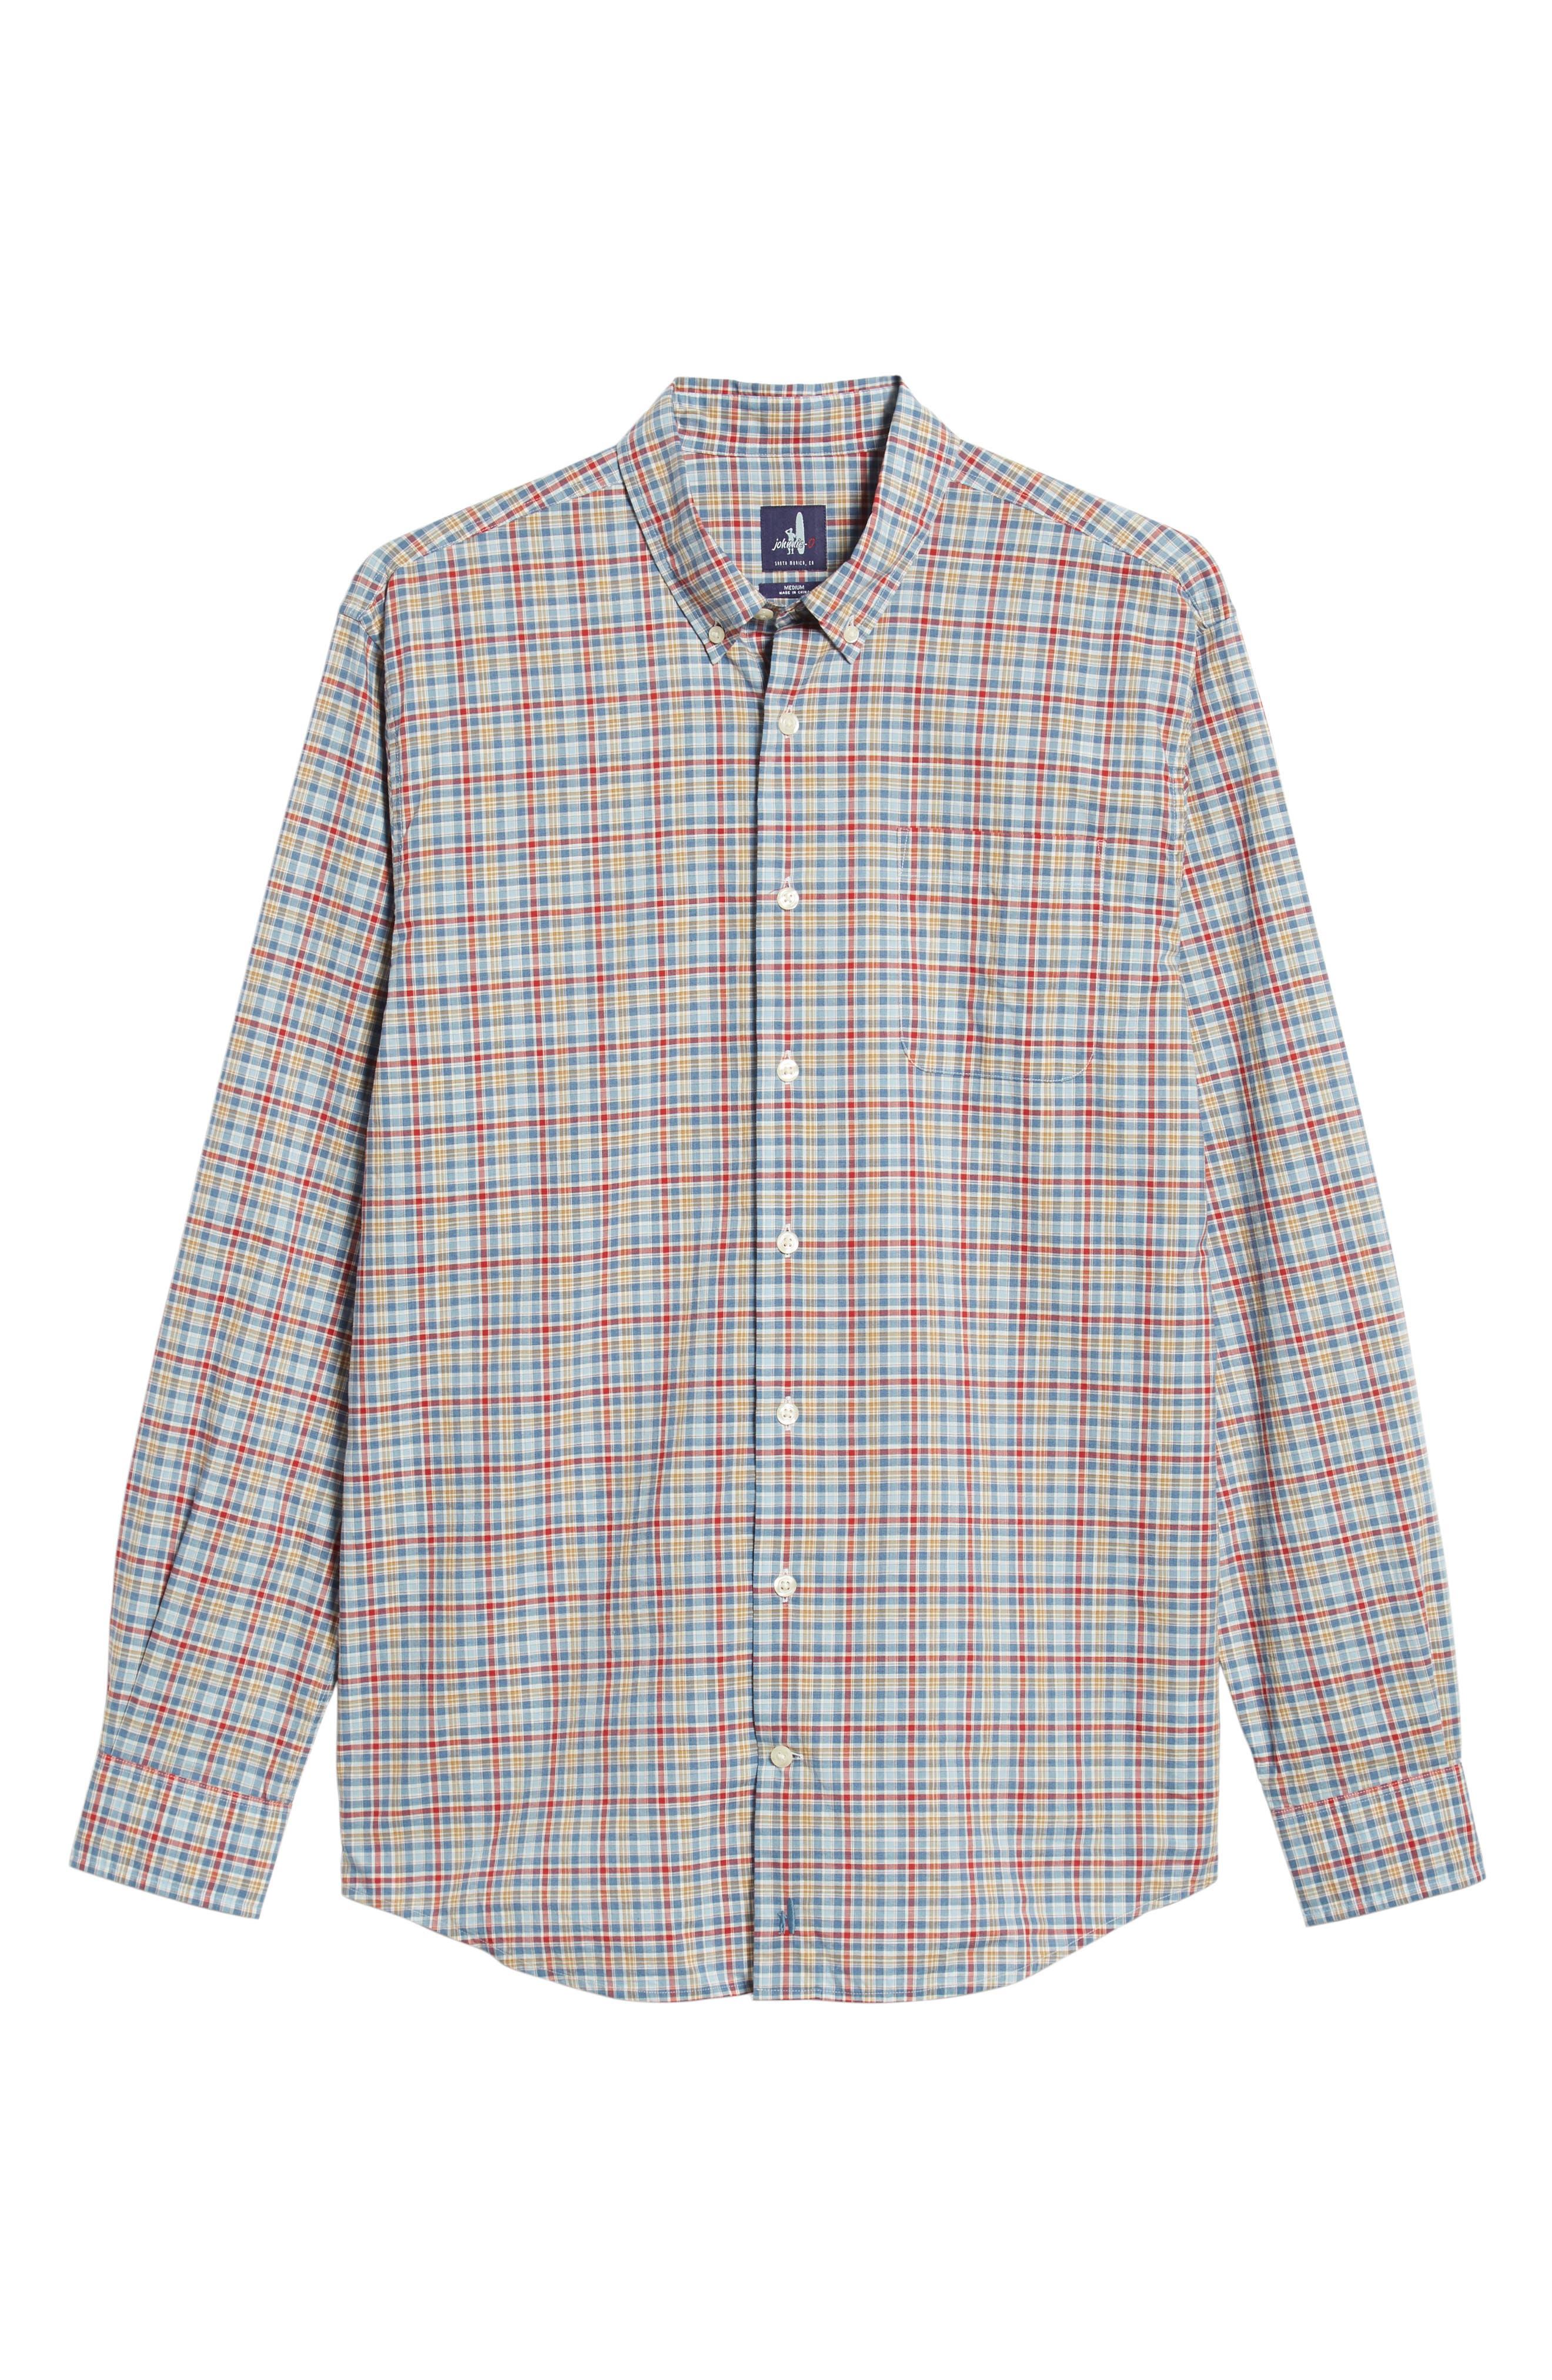 Ellis Classic Fit Sport Shirt,                             Alternate thumbnail 5, color,                             MARINER